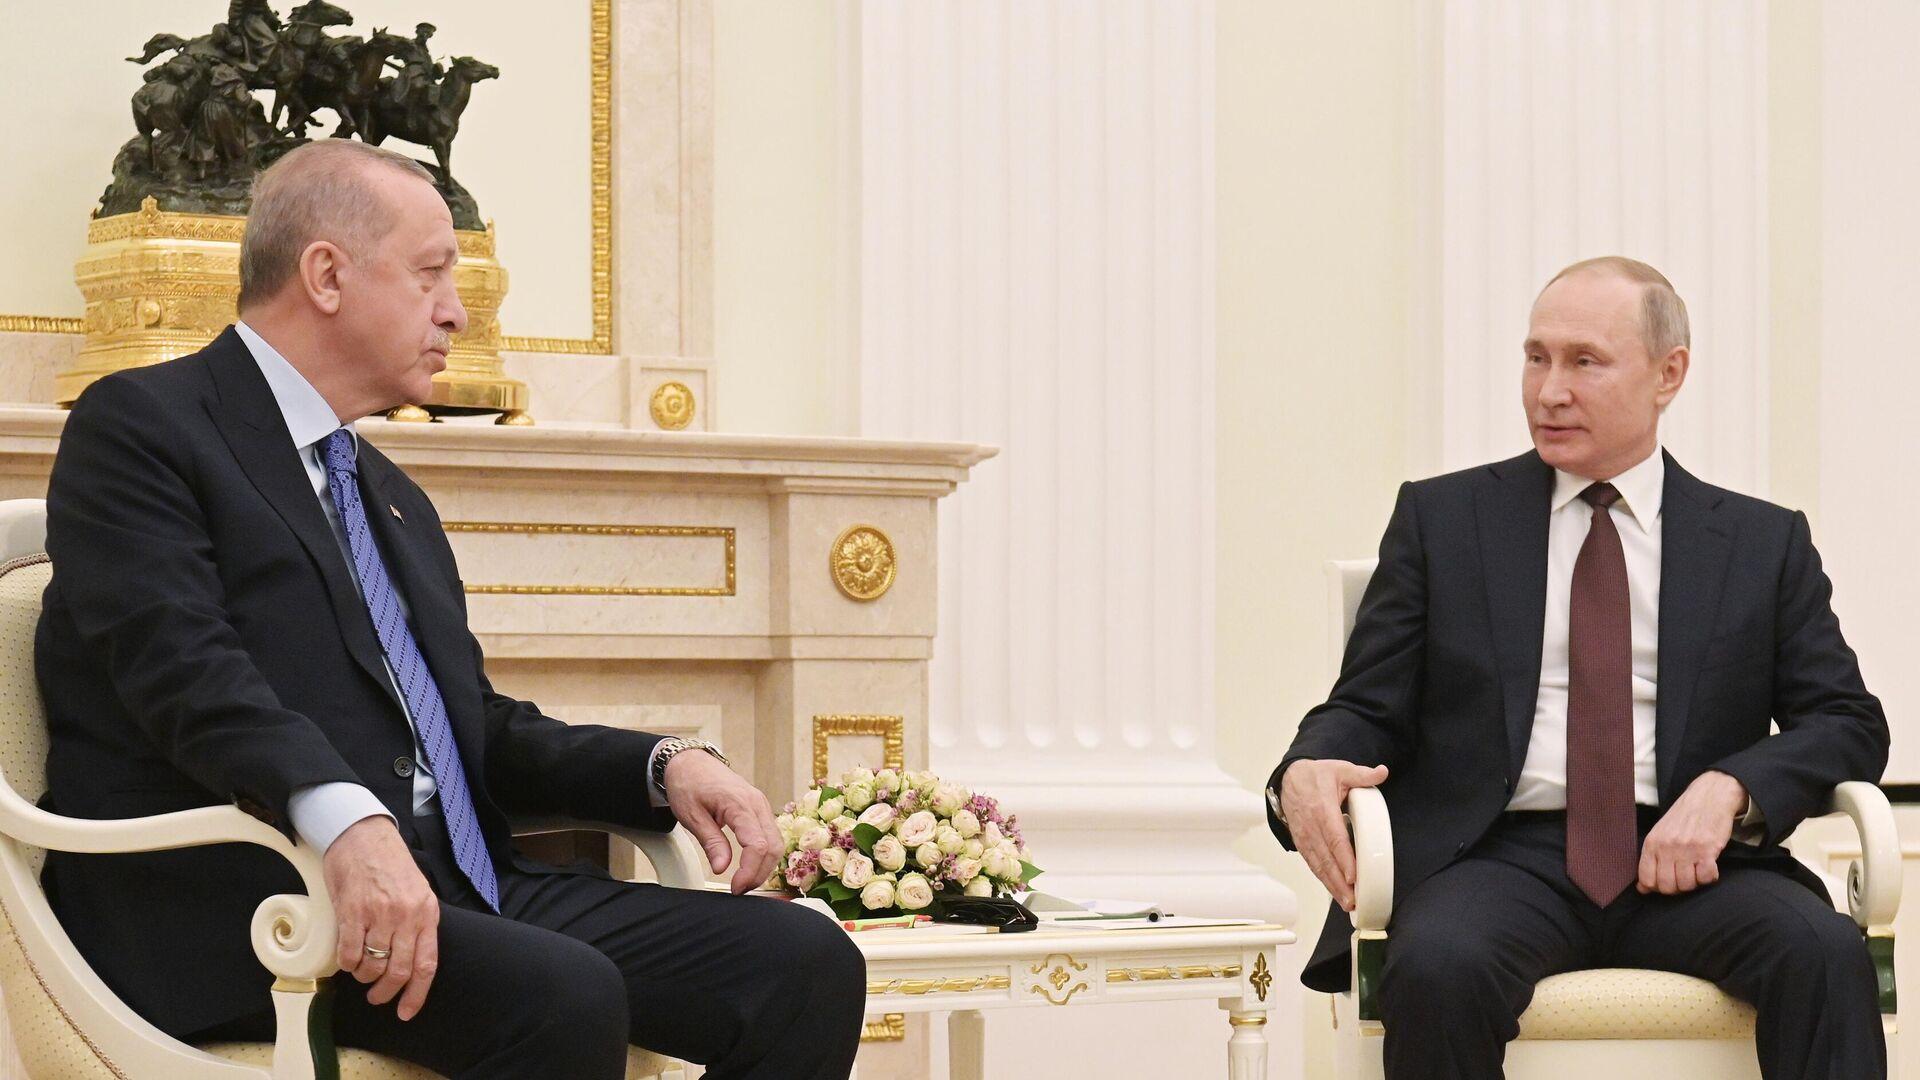 Президент РФ Владимир Путин и президент Турции Реджеп Тайип Эрдоган во время встречи - РИА Новости, 1920, 26.09.2021